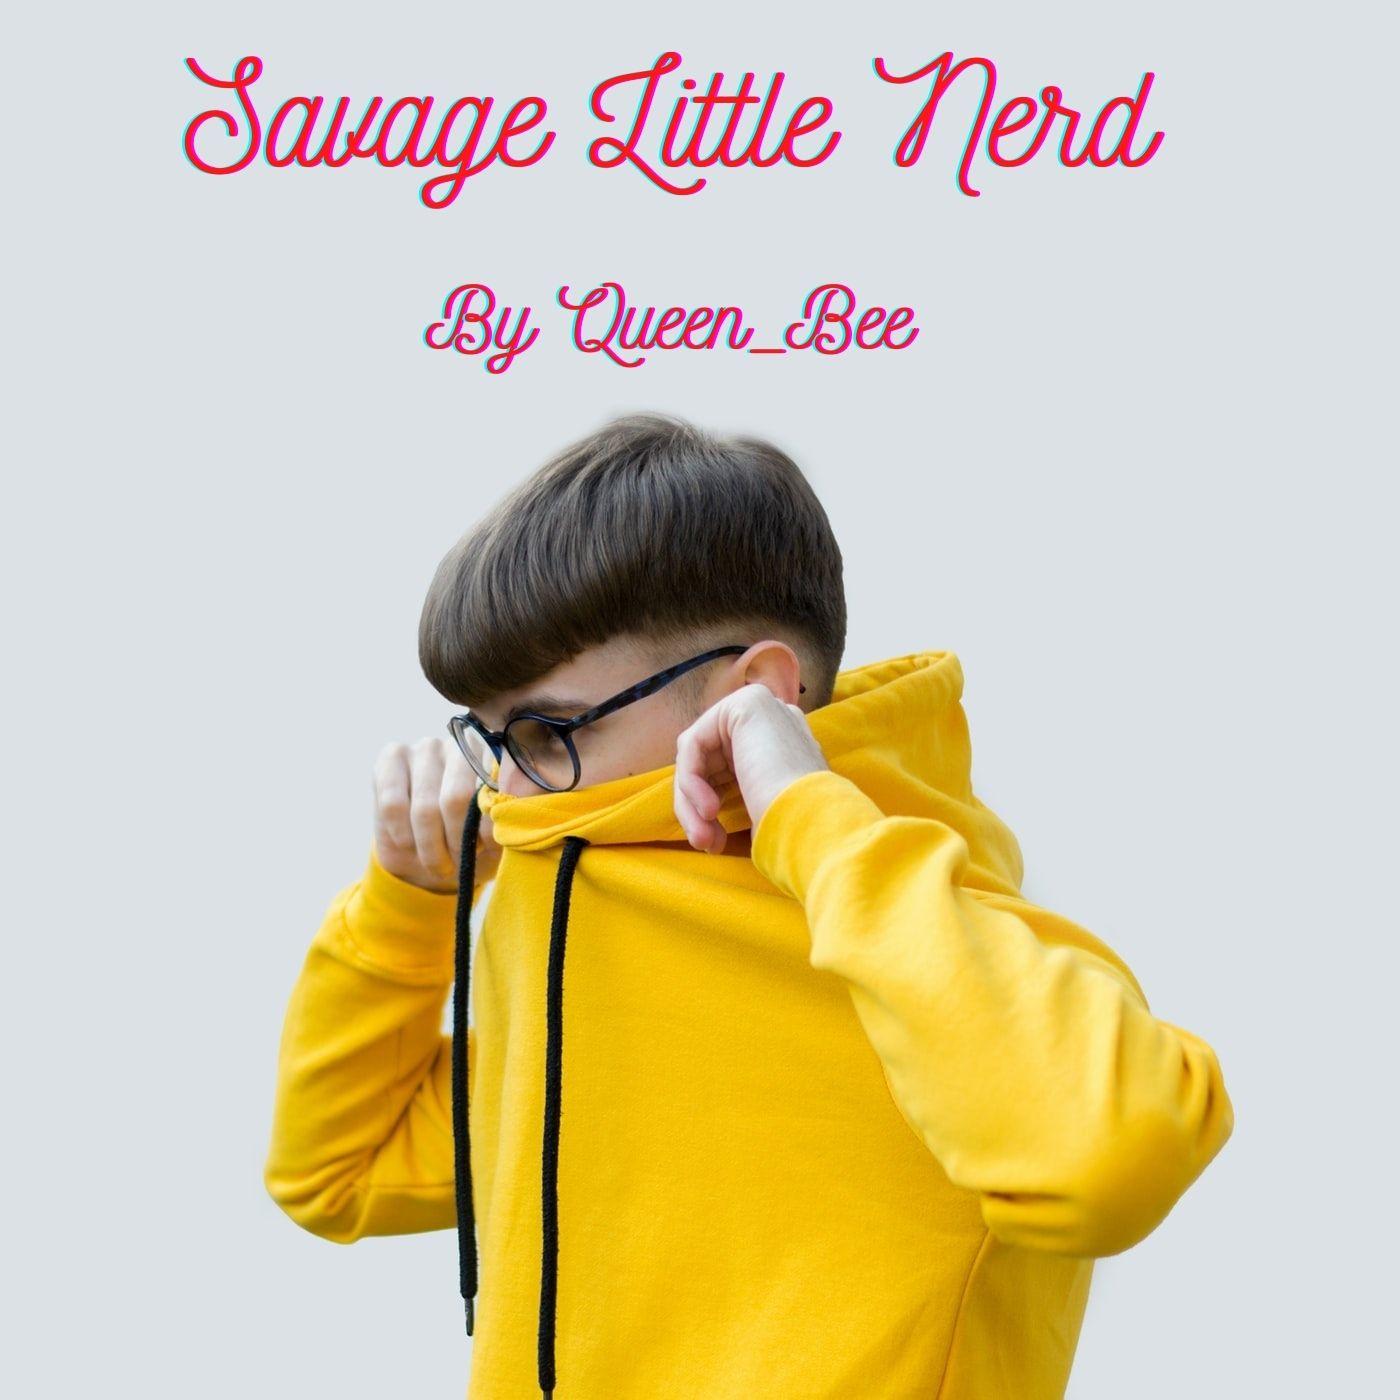 Savage Little Nerd